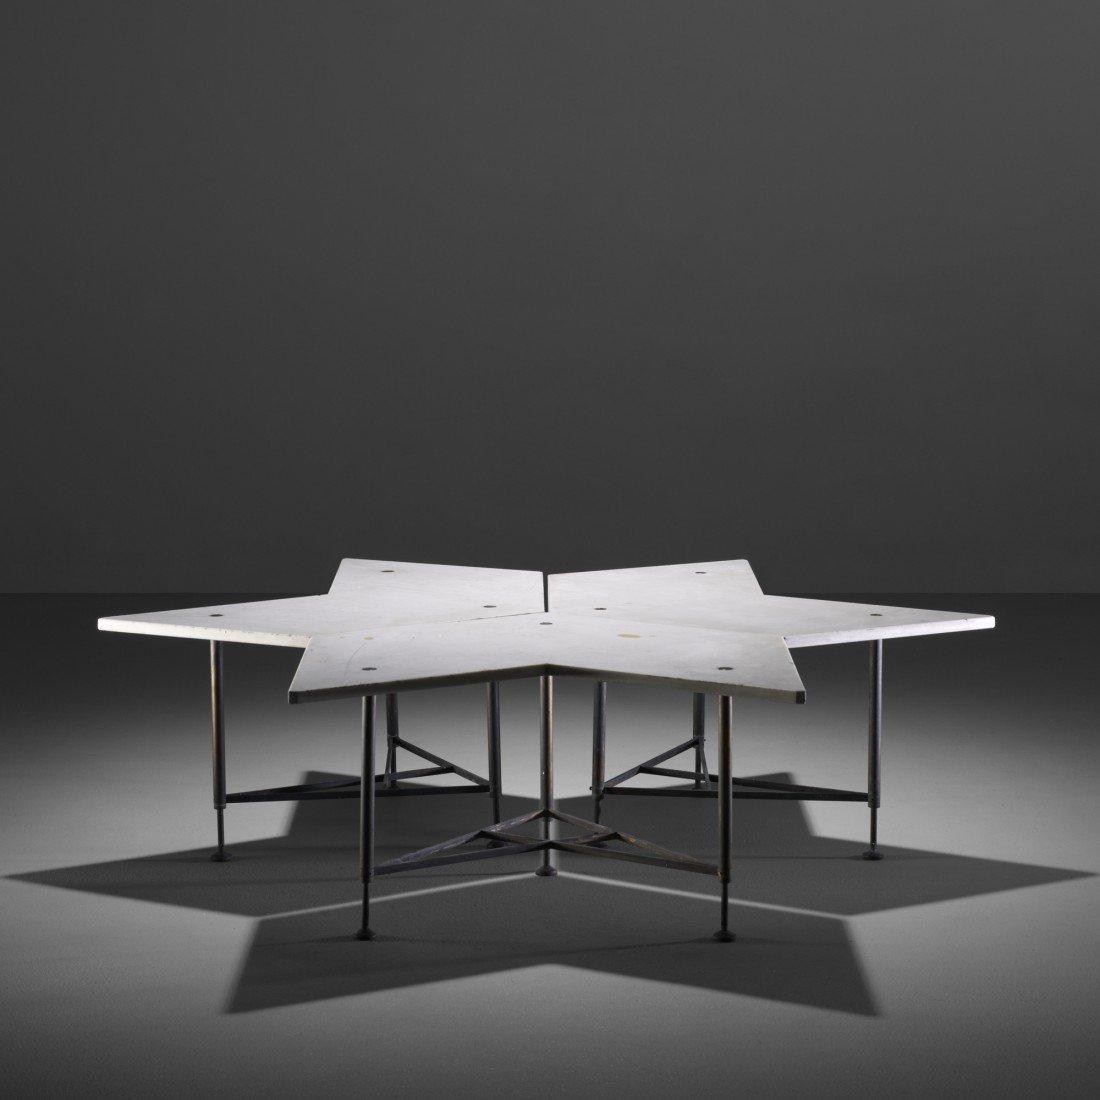 179: Gio Ponti important set of coffee tables